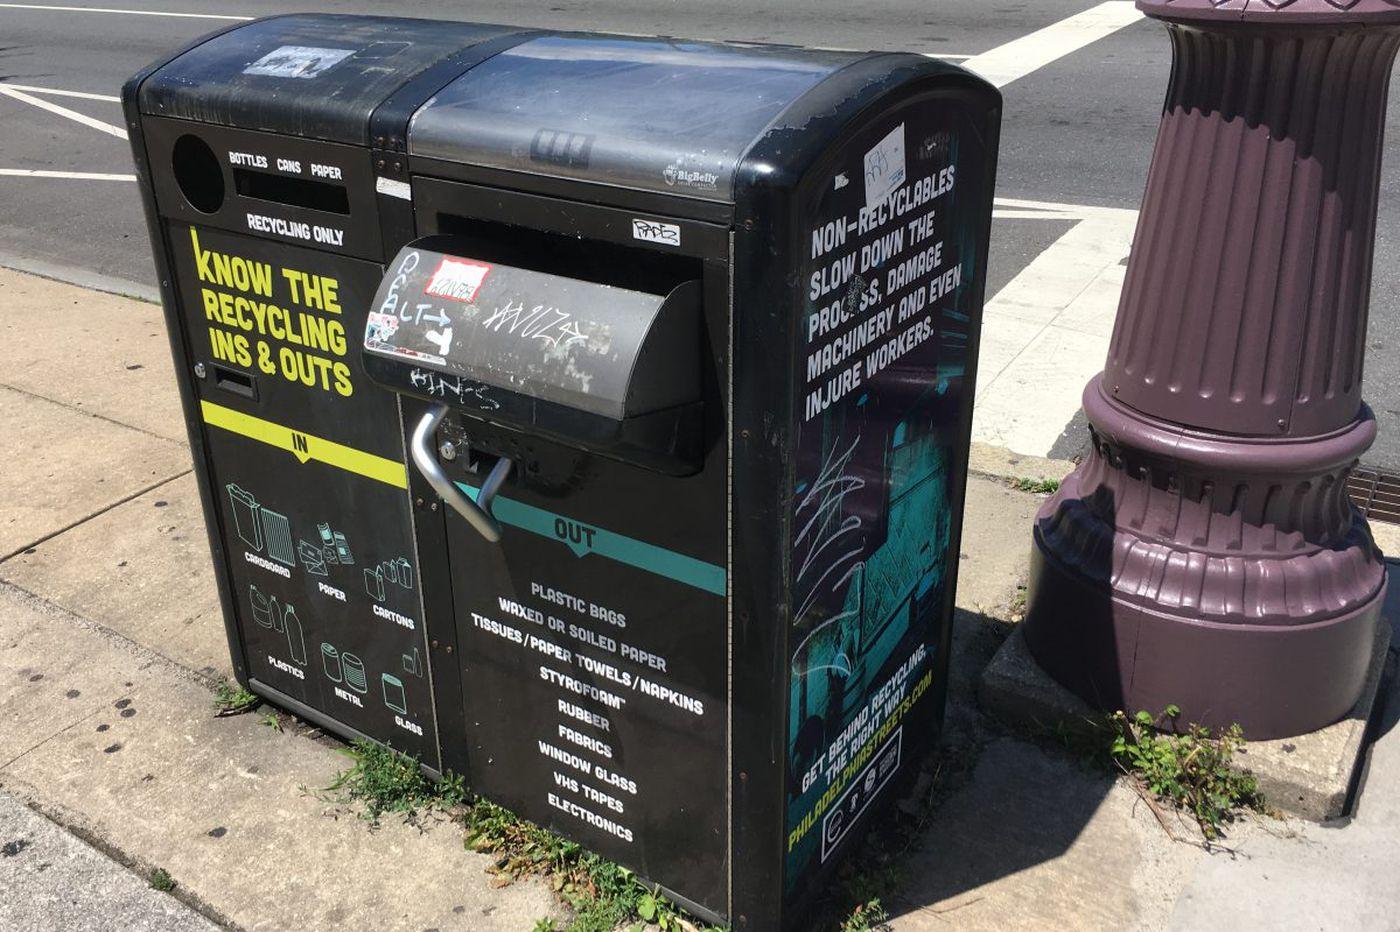 Why high-tech trash cans didn't work